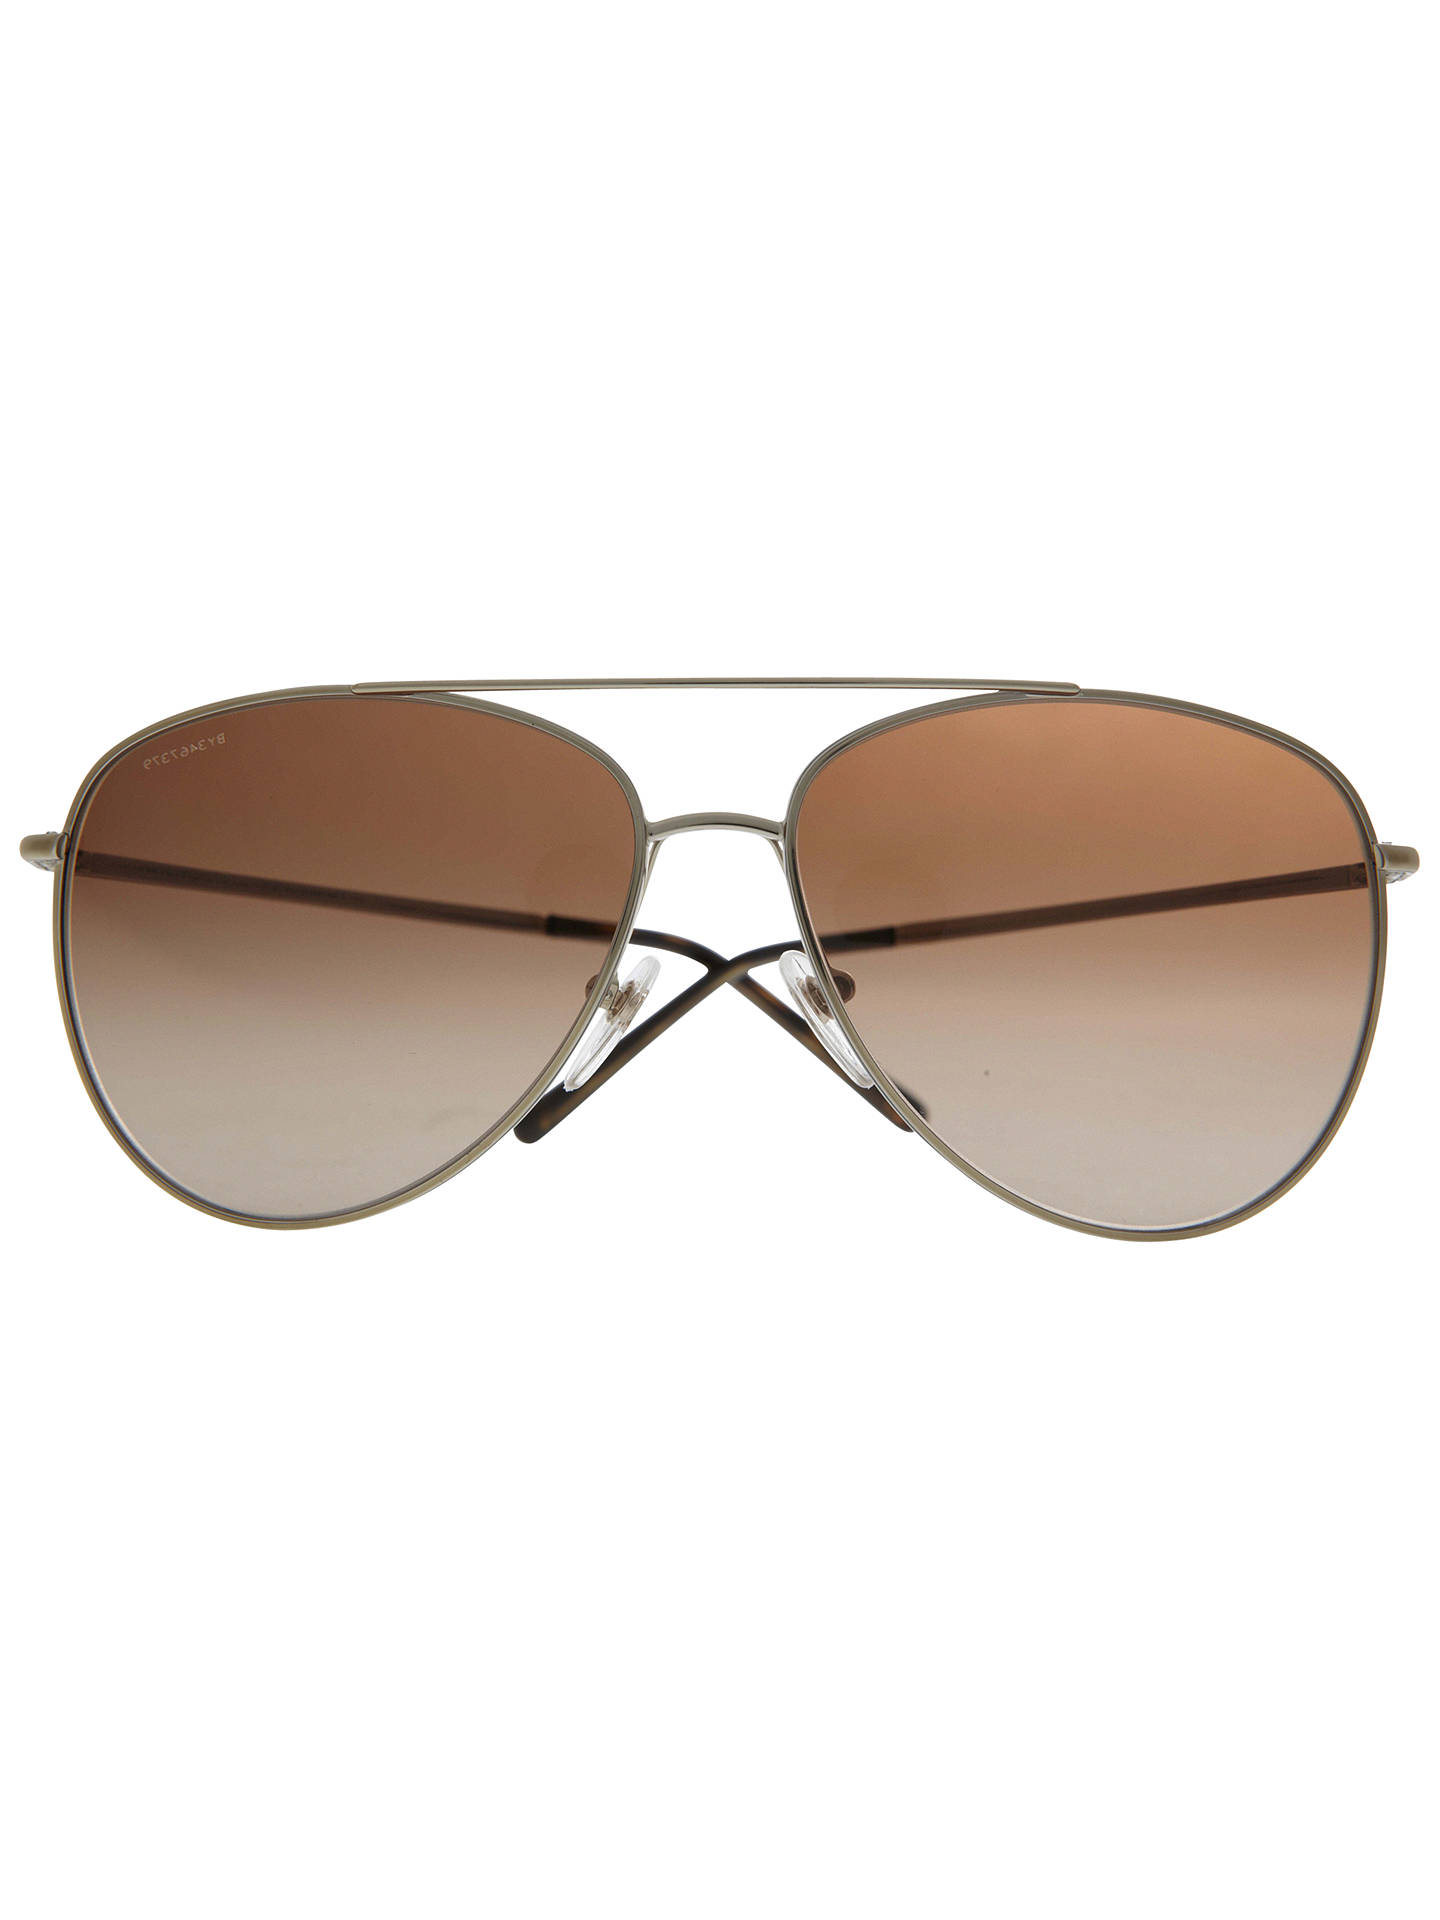 ddc9ee64cc9 ... Buy Burberry BE3072 Aviator Sunglasses